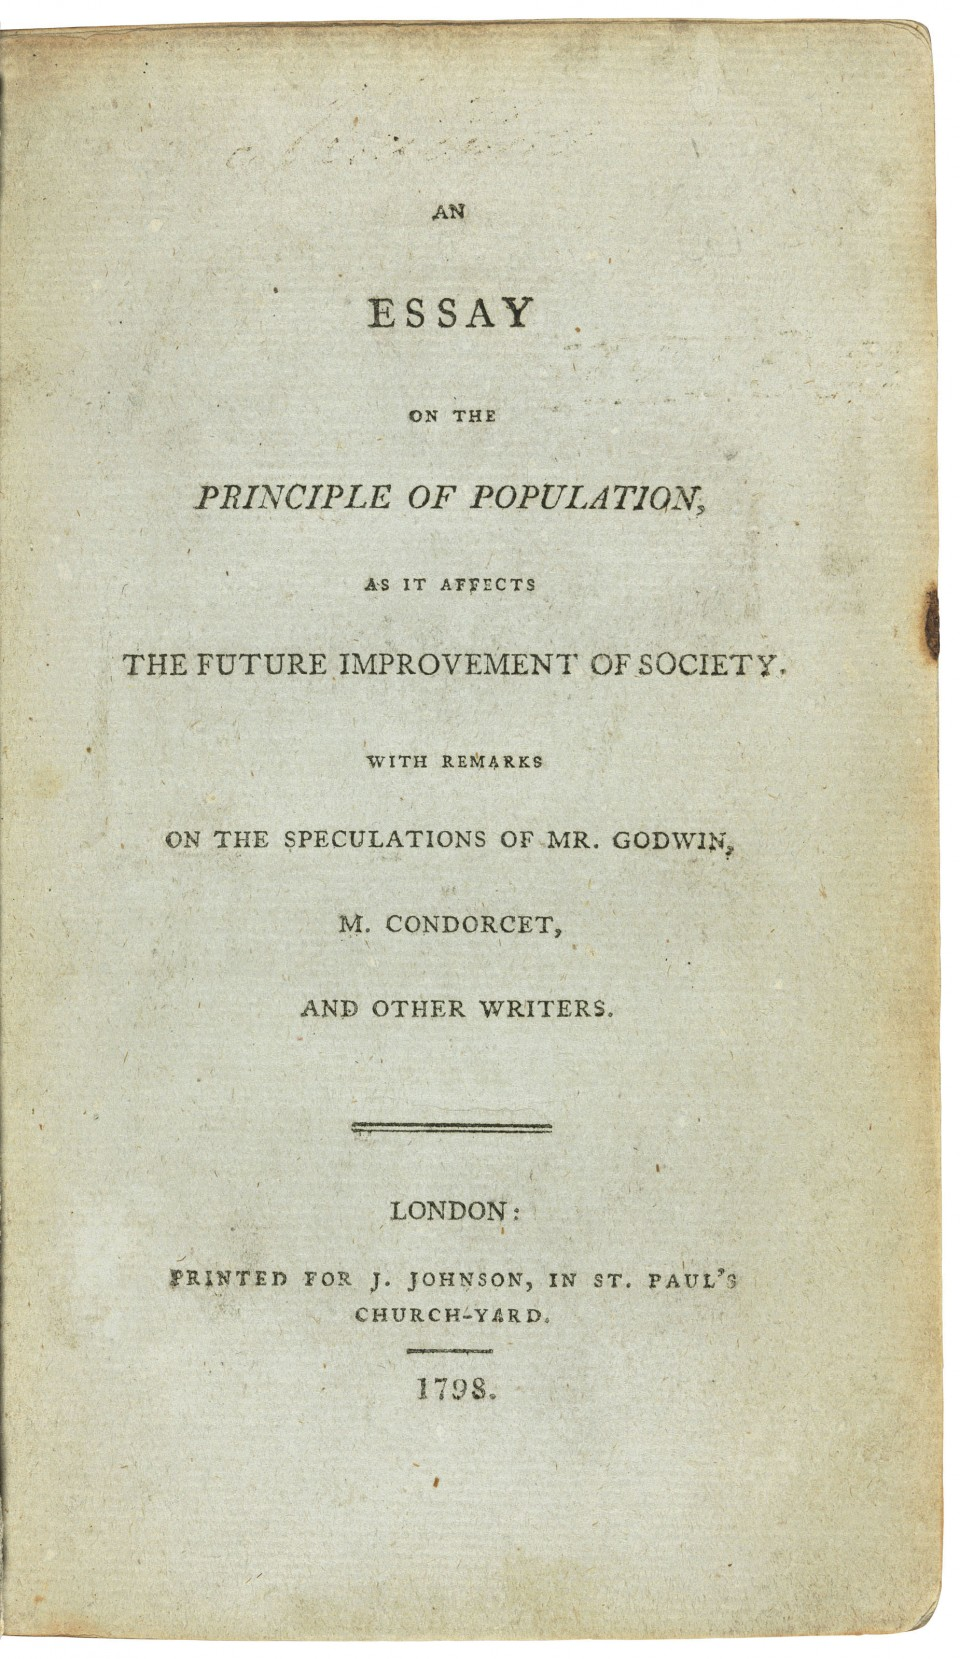 013 2018 Cks 16018 0261 000malthus Thomas Robert An Essay On The Principle Of As It Af Example Singular Population Malthus Sparknotes Main Idea 960